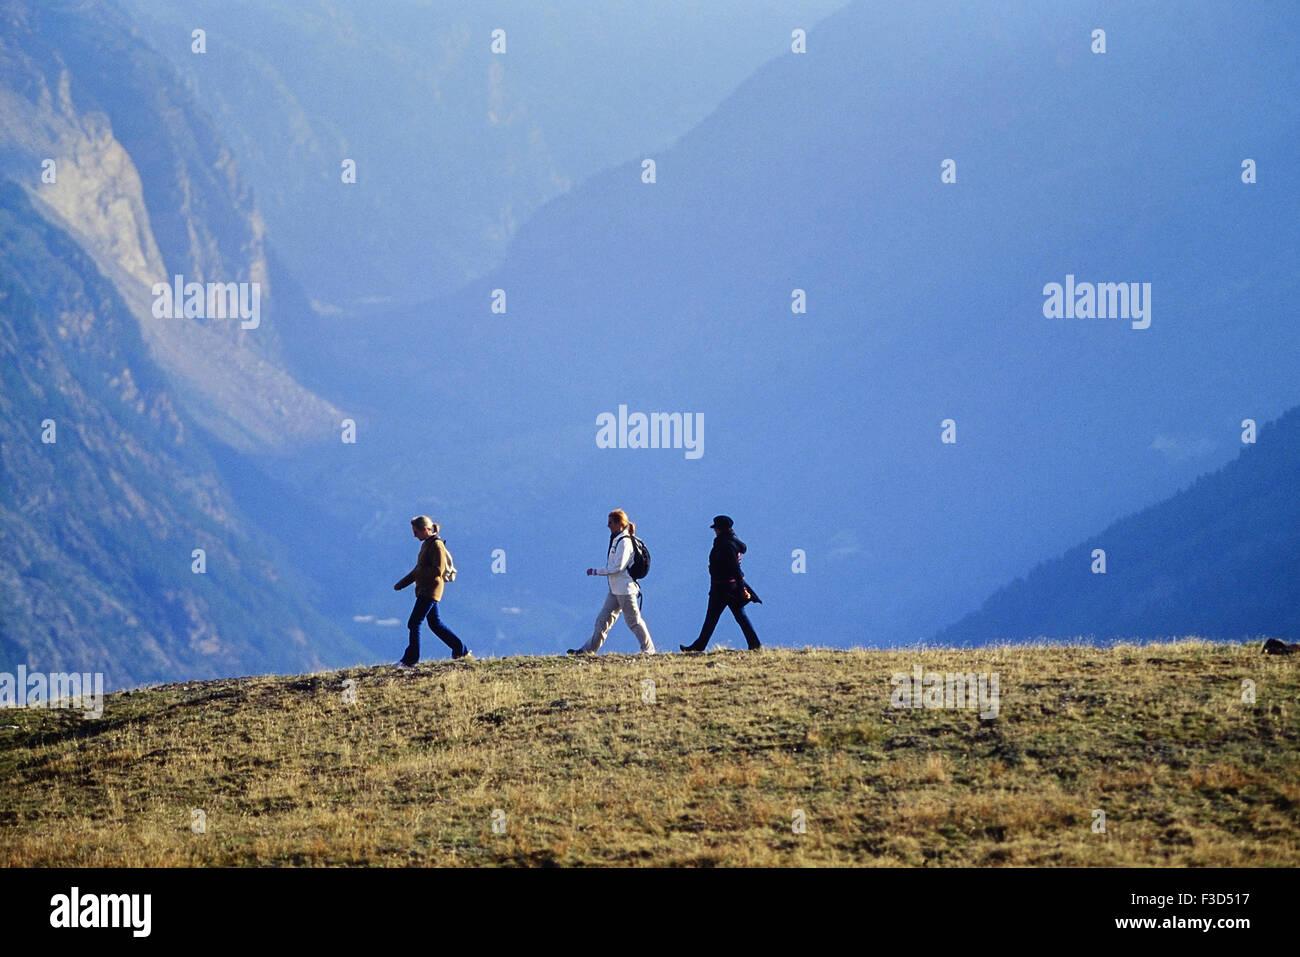 drei Frauen wandern über den alpinen Ferienort Zermatt. Schweiz. Europa Stockbild